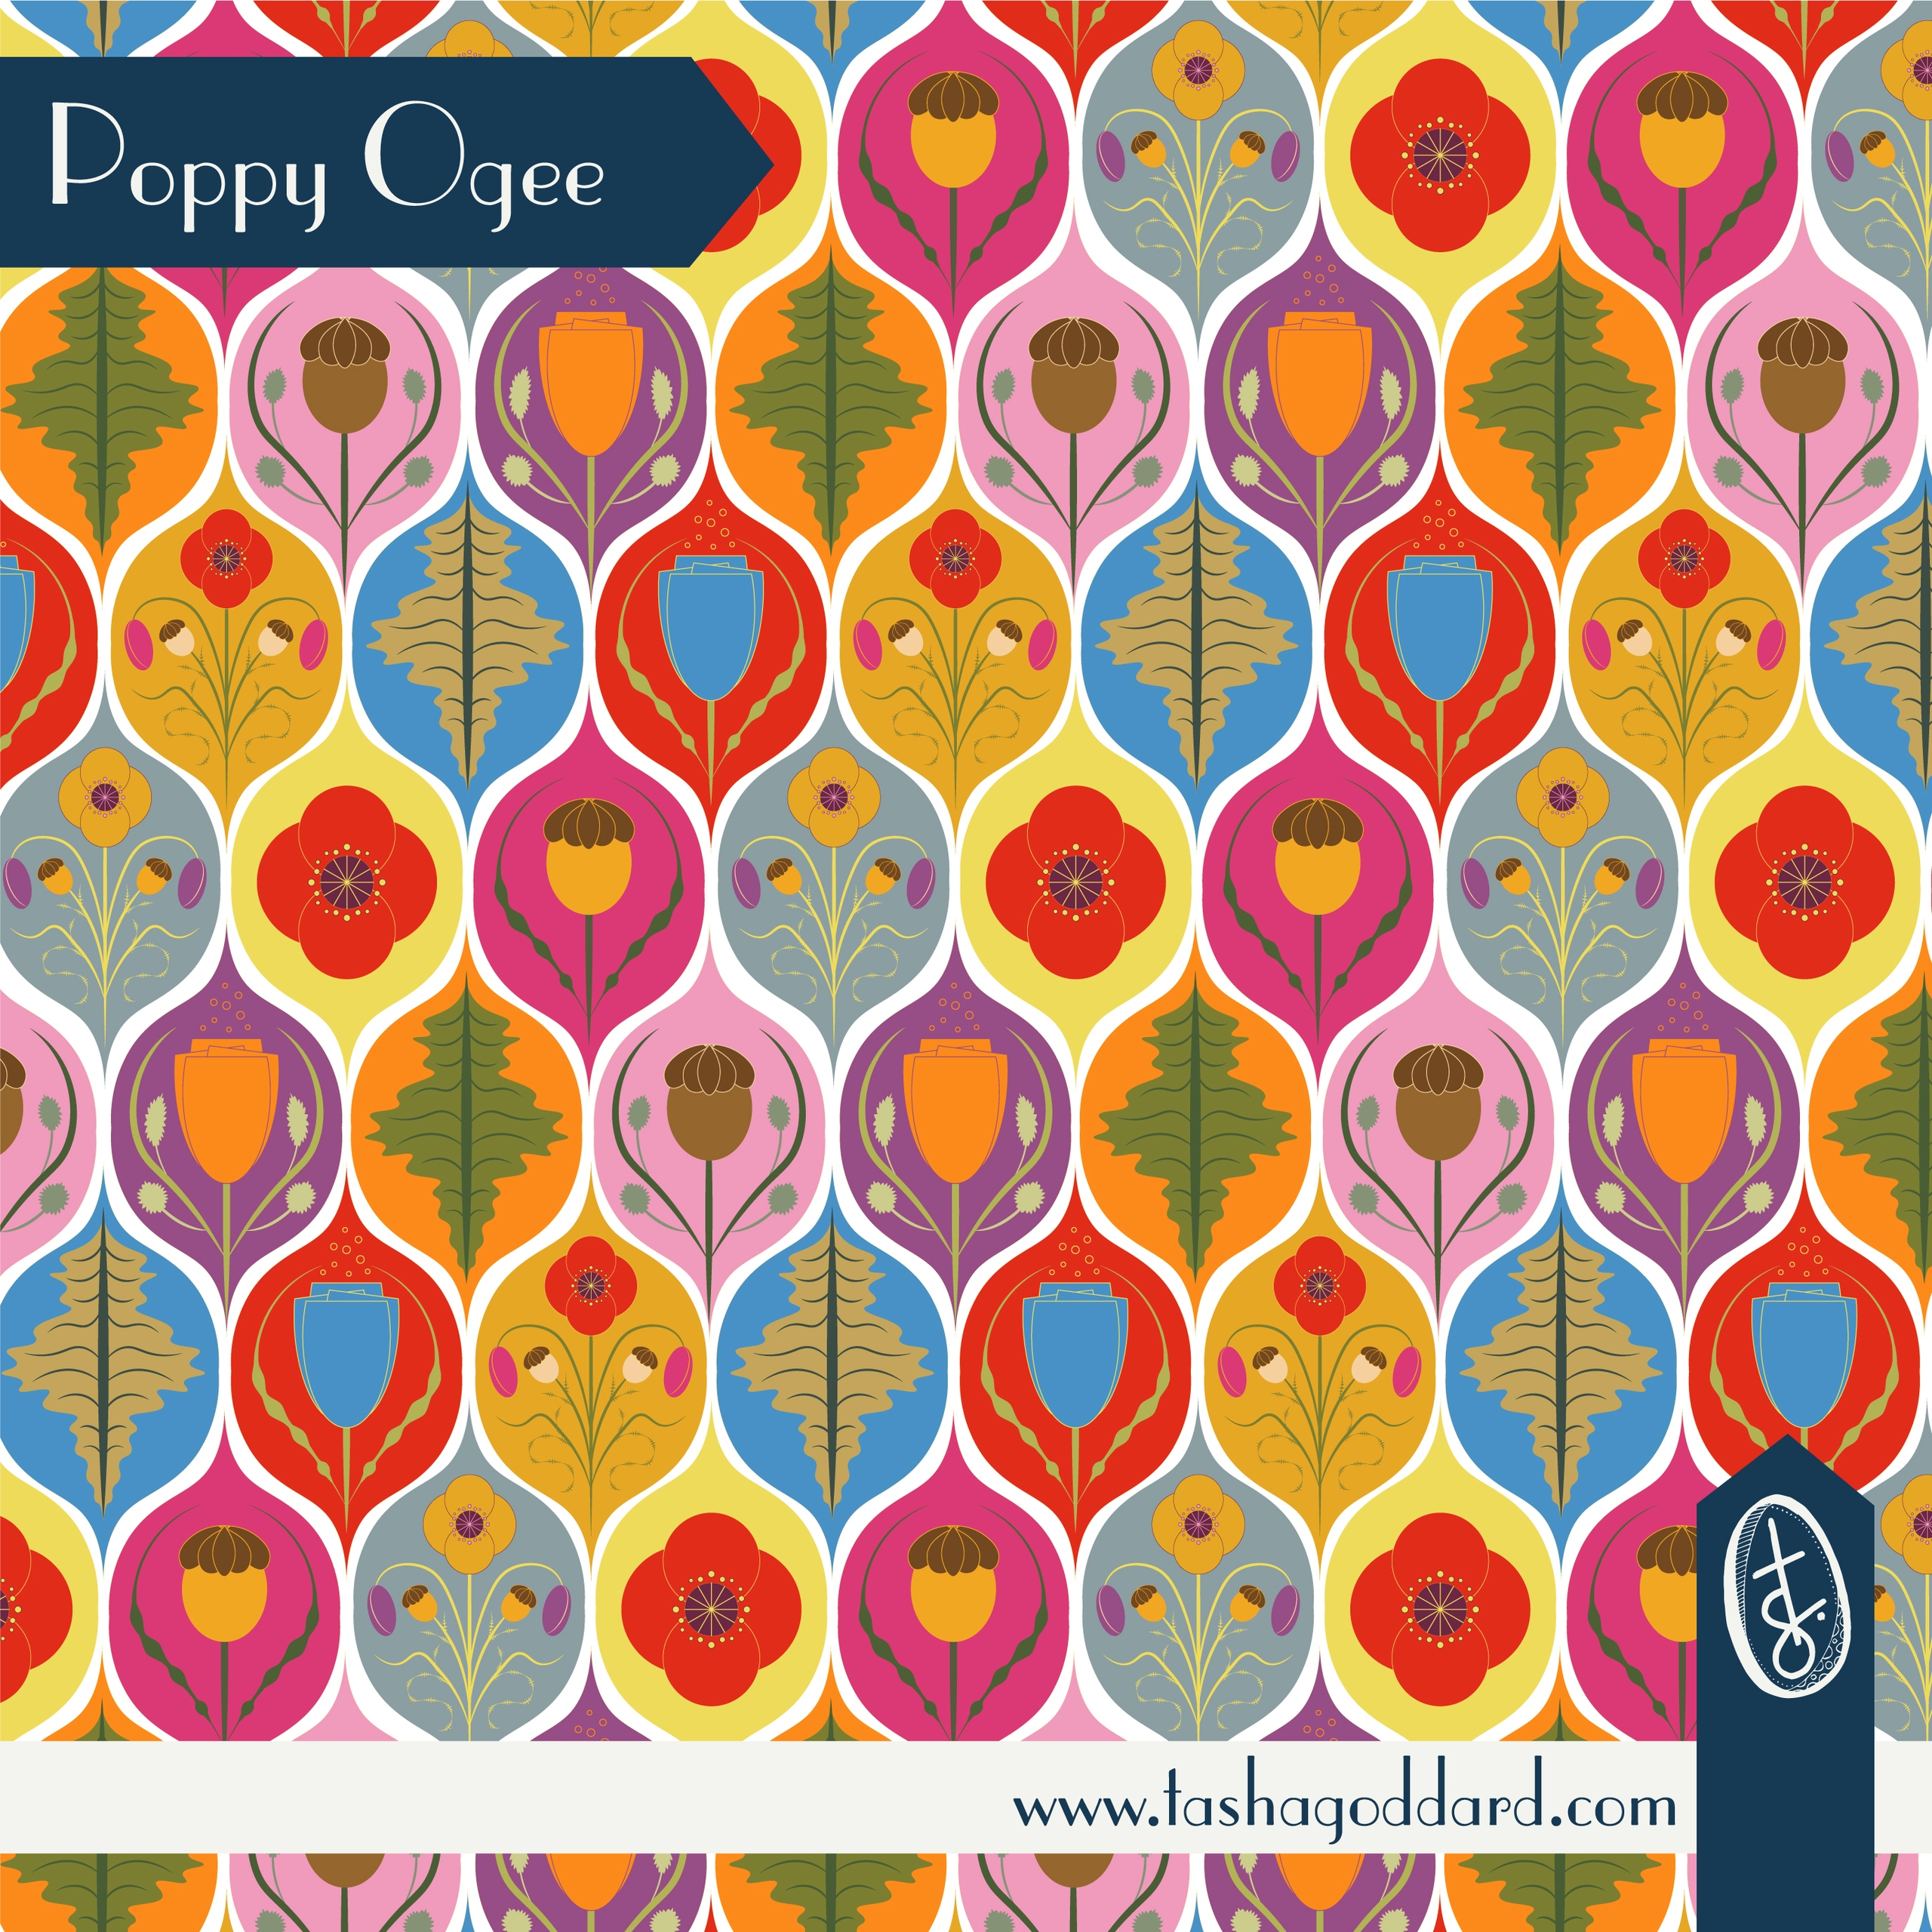 Poppy Ogee - ogee,poppy,floral,pattern - tashagoddard | ello